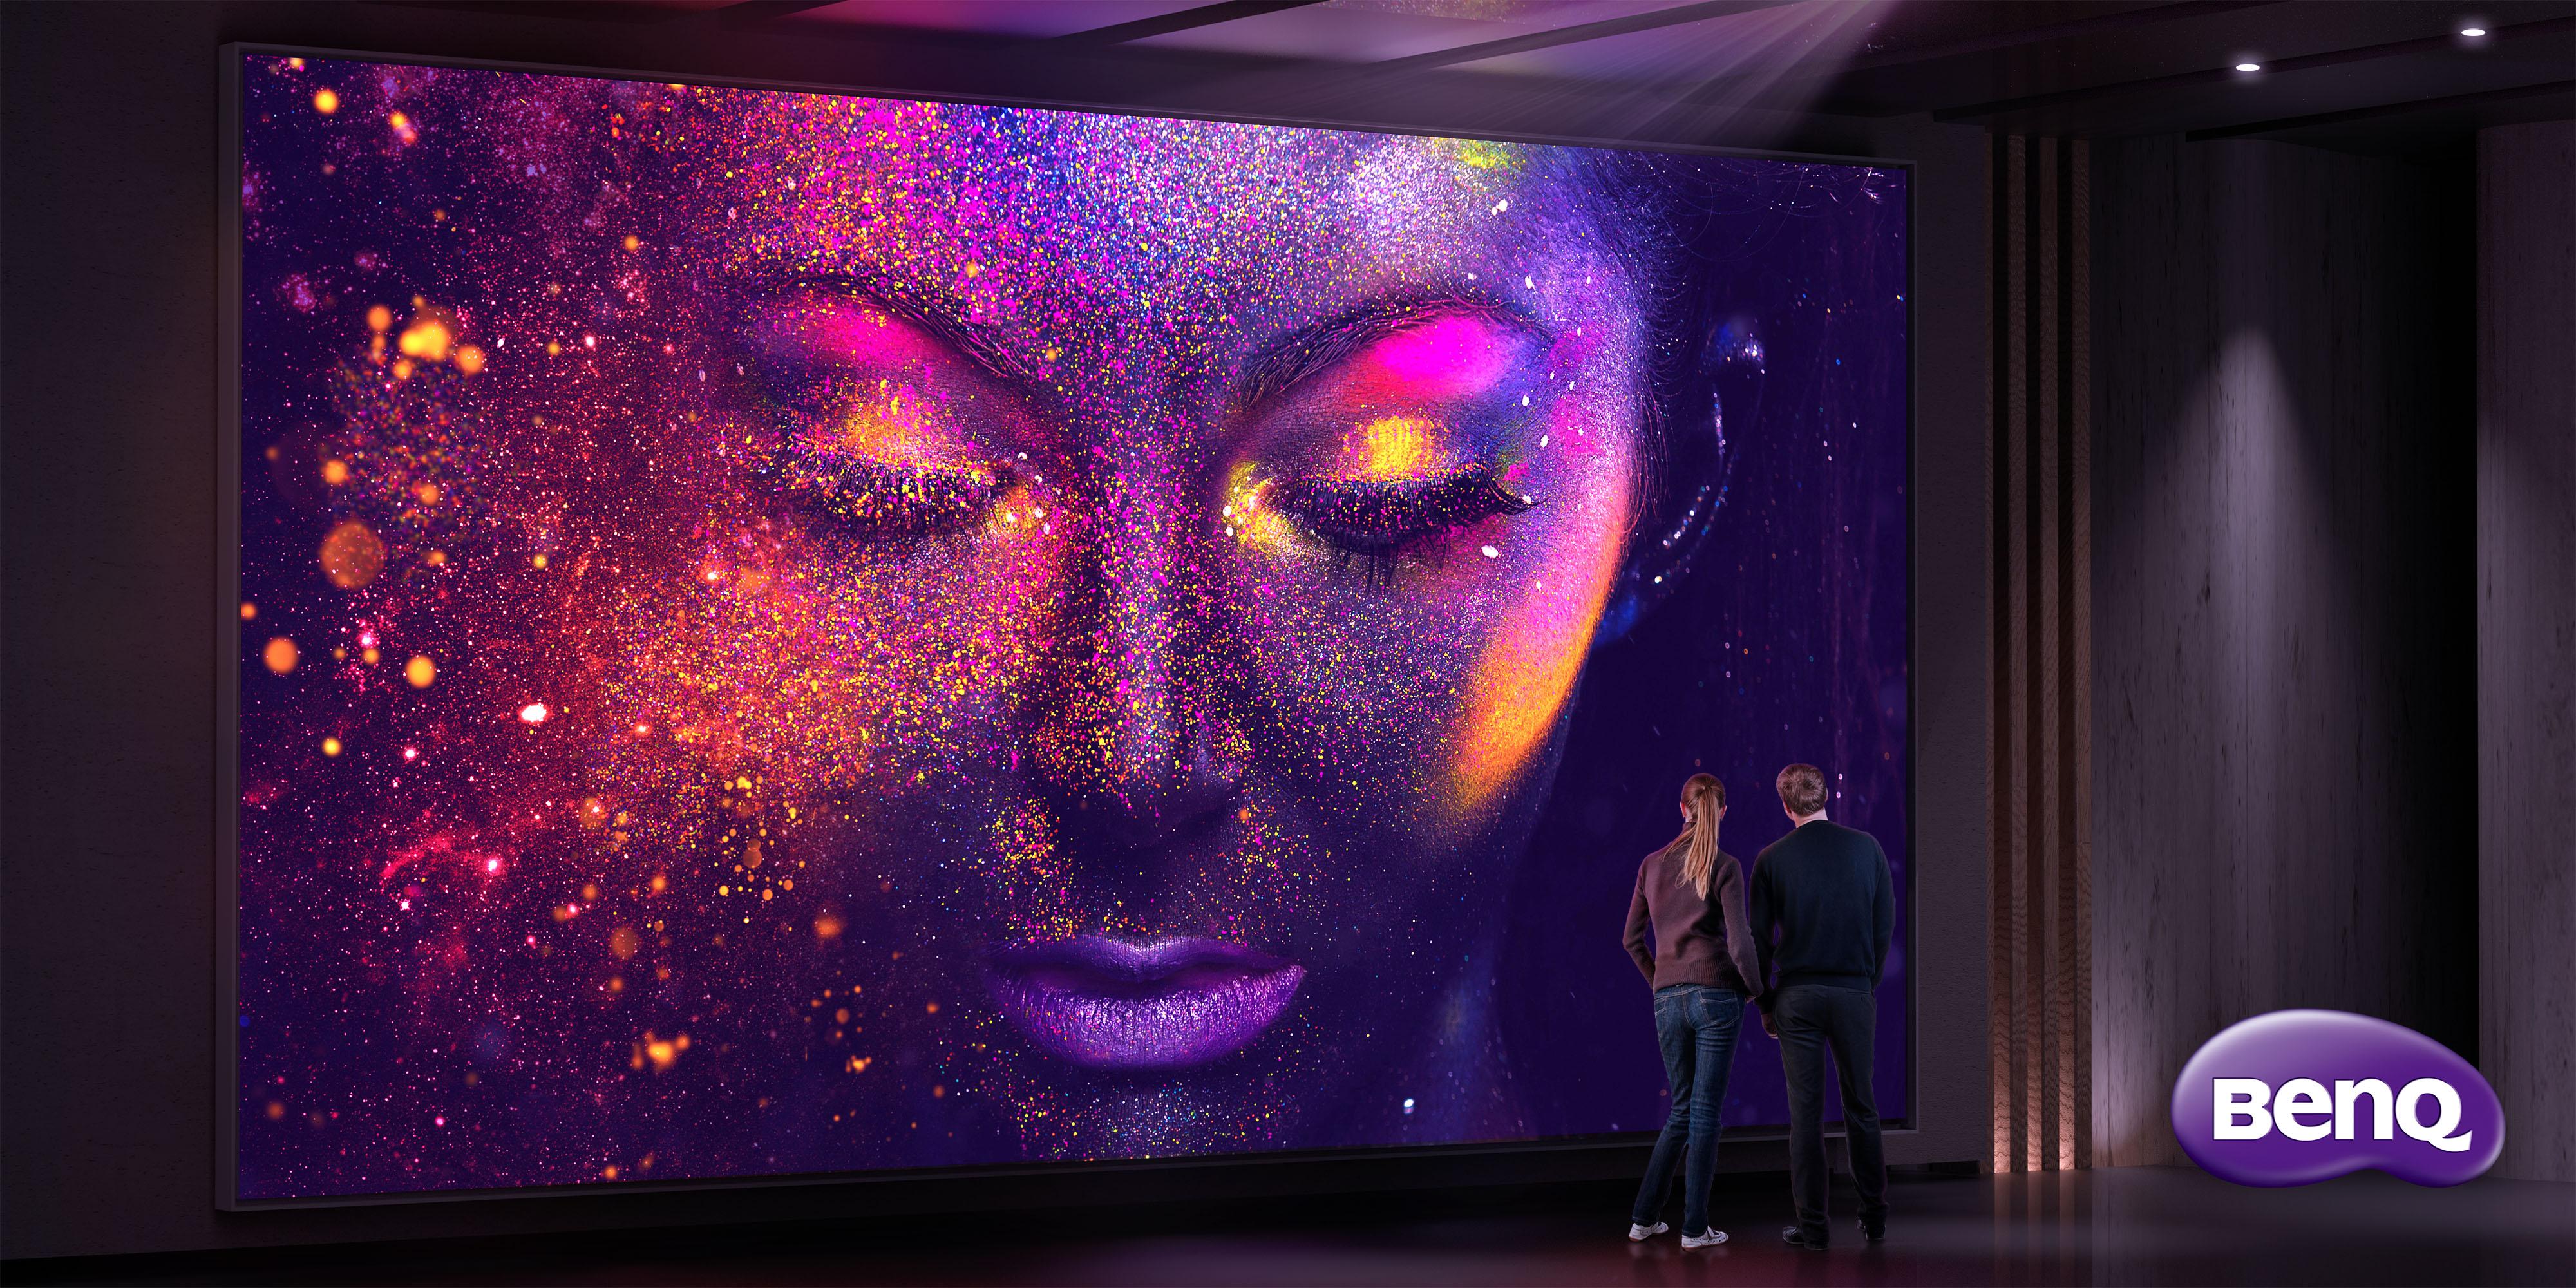 BenQ aduce pasionaţilor de filme primul proiector Home Cinema DLP 4K UHD DCI-P3 LED